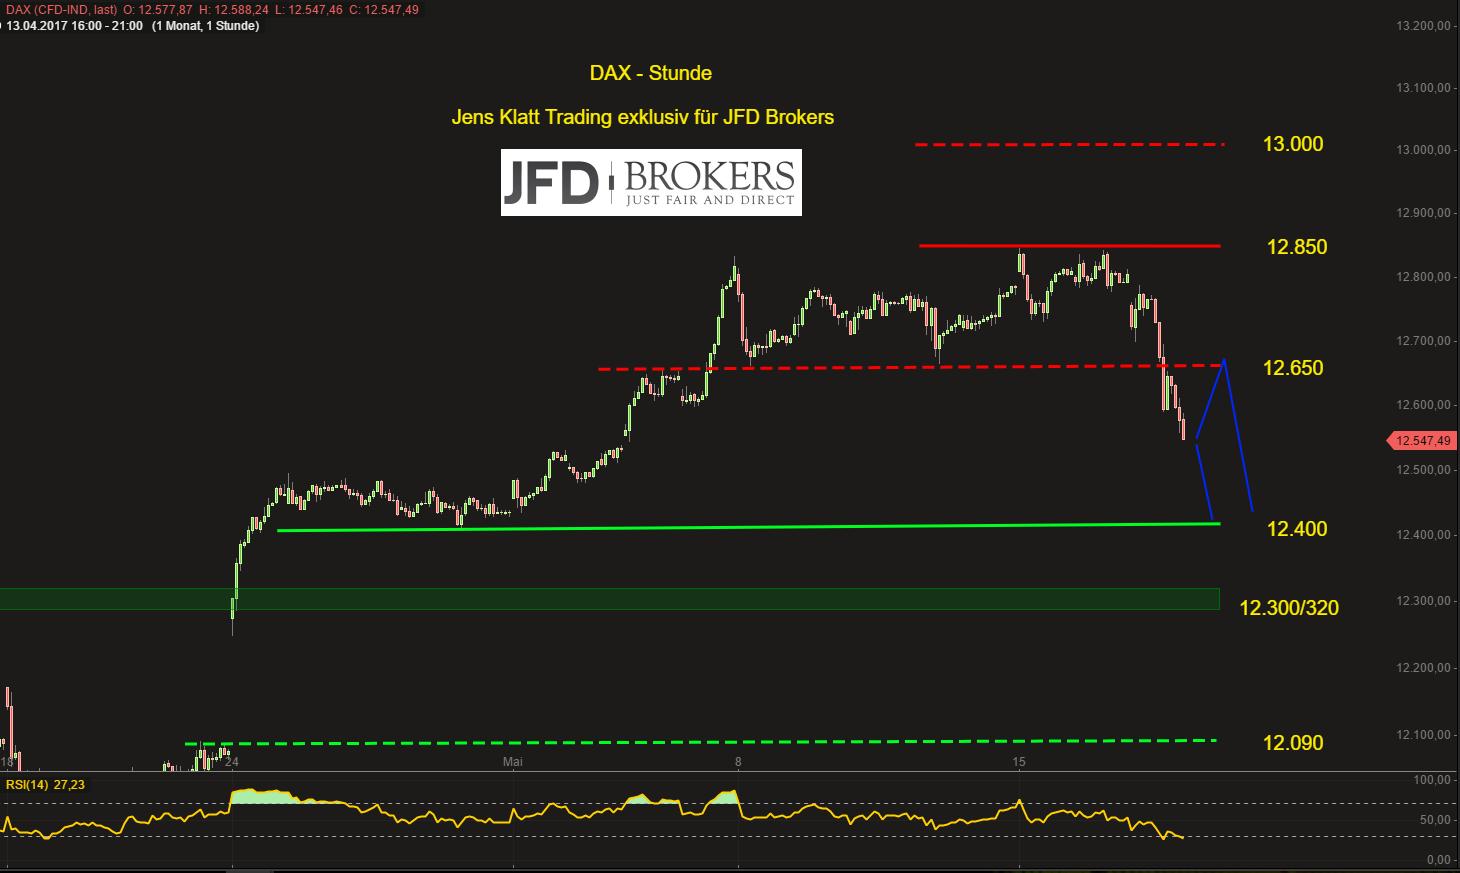 DAX-bricht-die-12-650-nächstes-Ziel-um-12-400-JFD-Brokers-GodmodeTrader.de-2